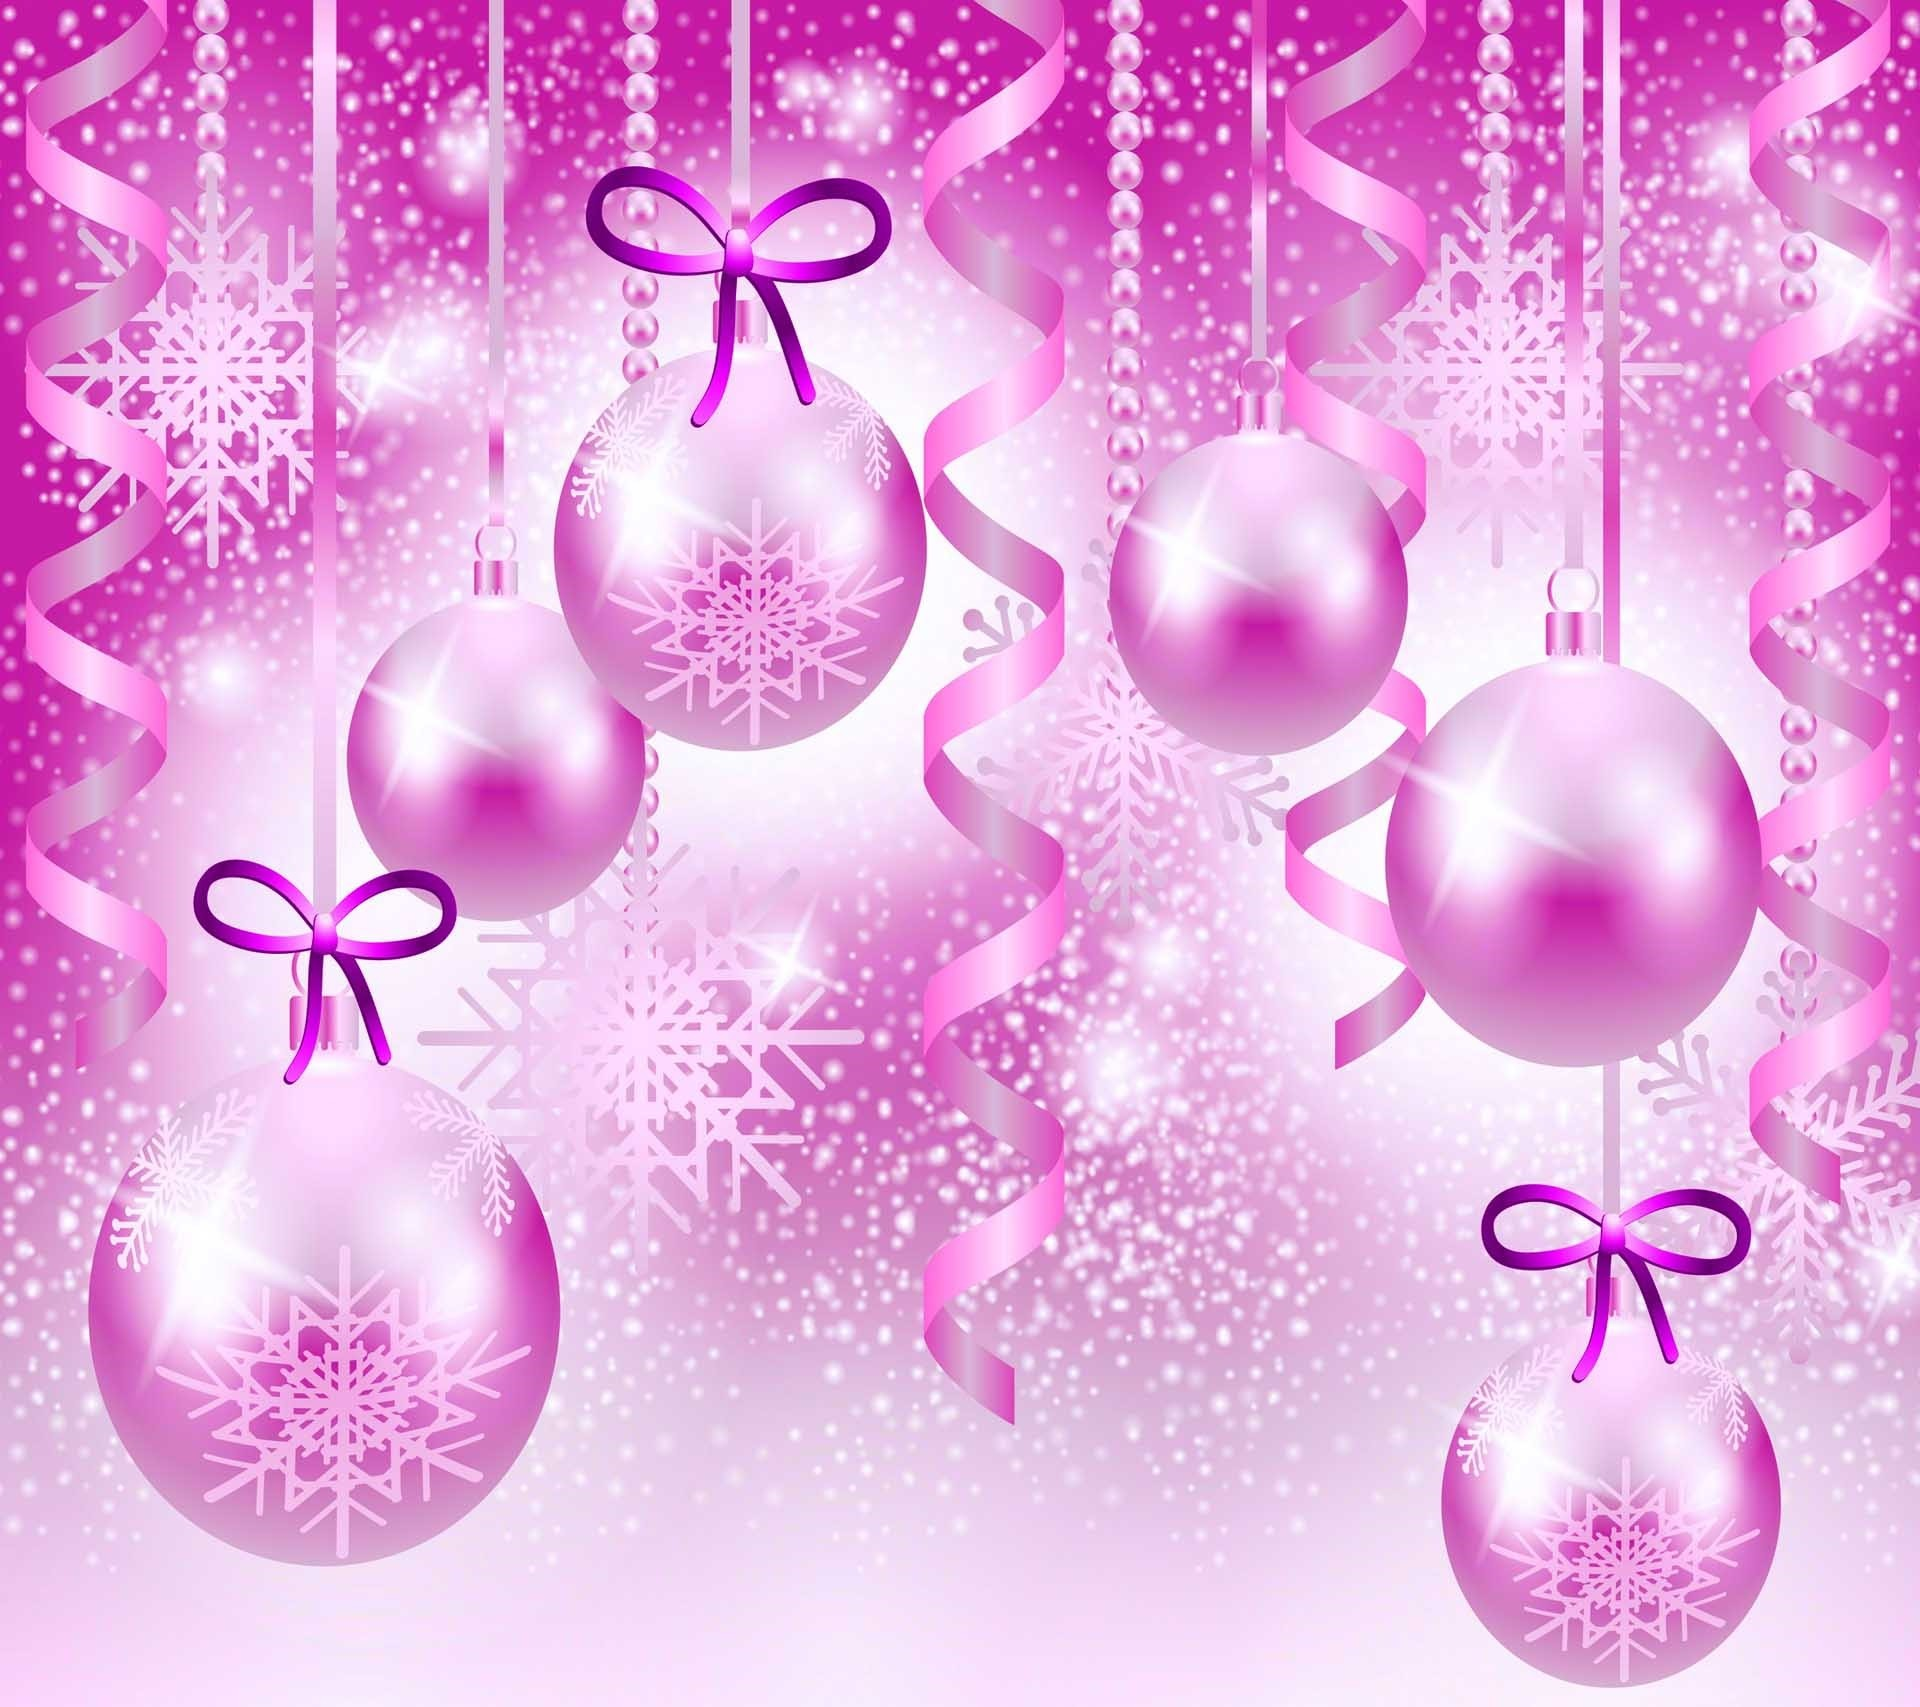 … Pink Christmas Wallpaper 2015 pink Christmas backgrounds …